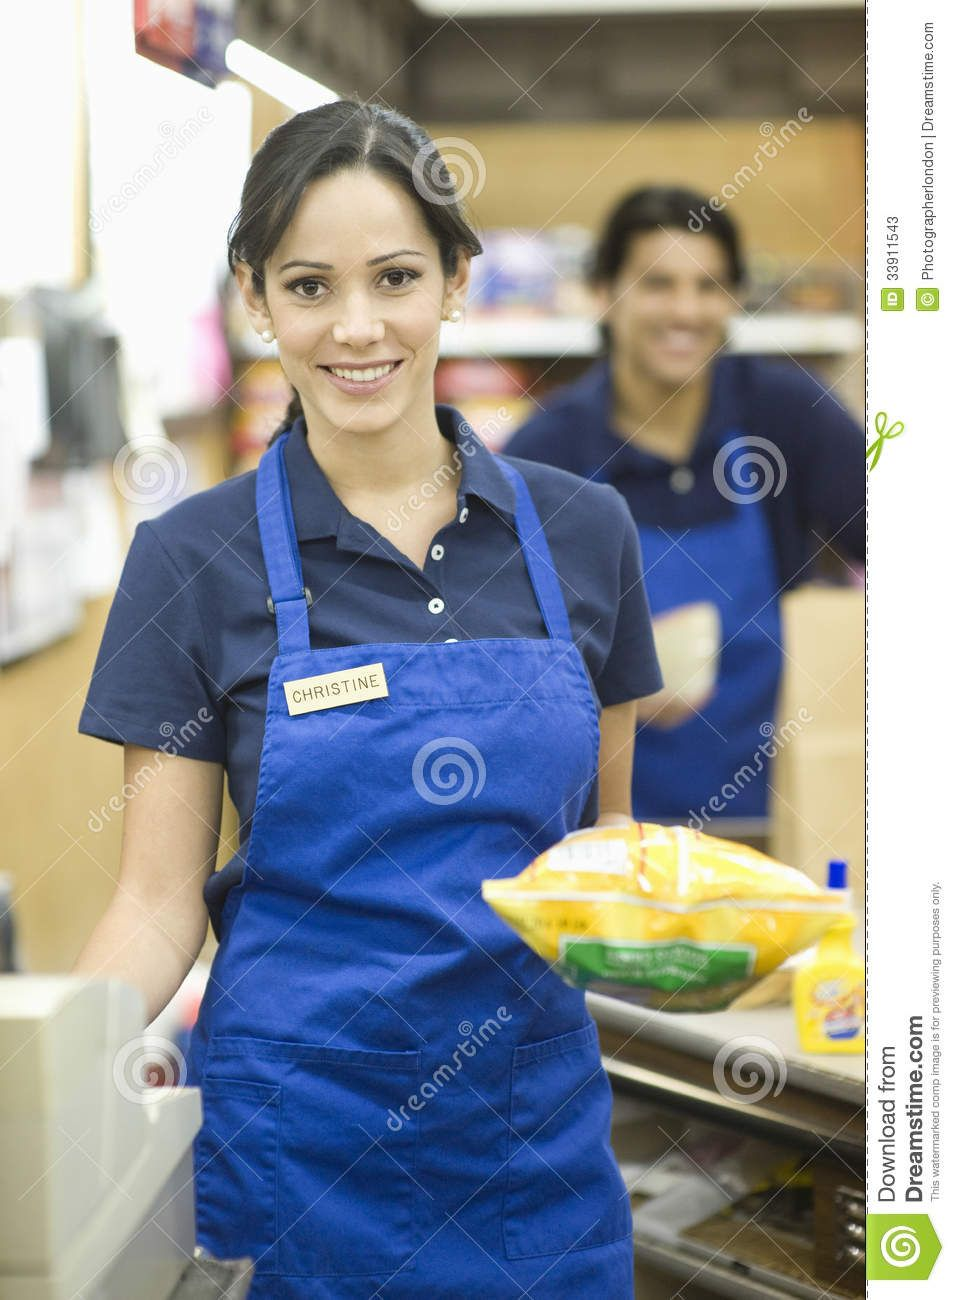 Blue apron employee reviews - Supermarket Employee Blue Apron Portrait Male Female Employees